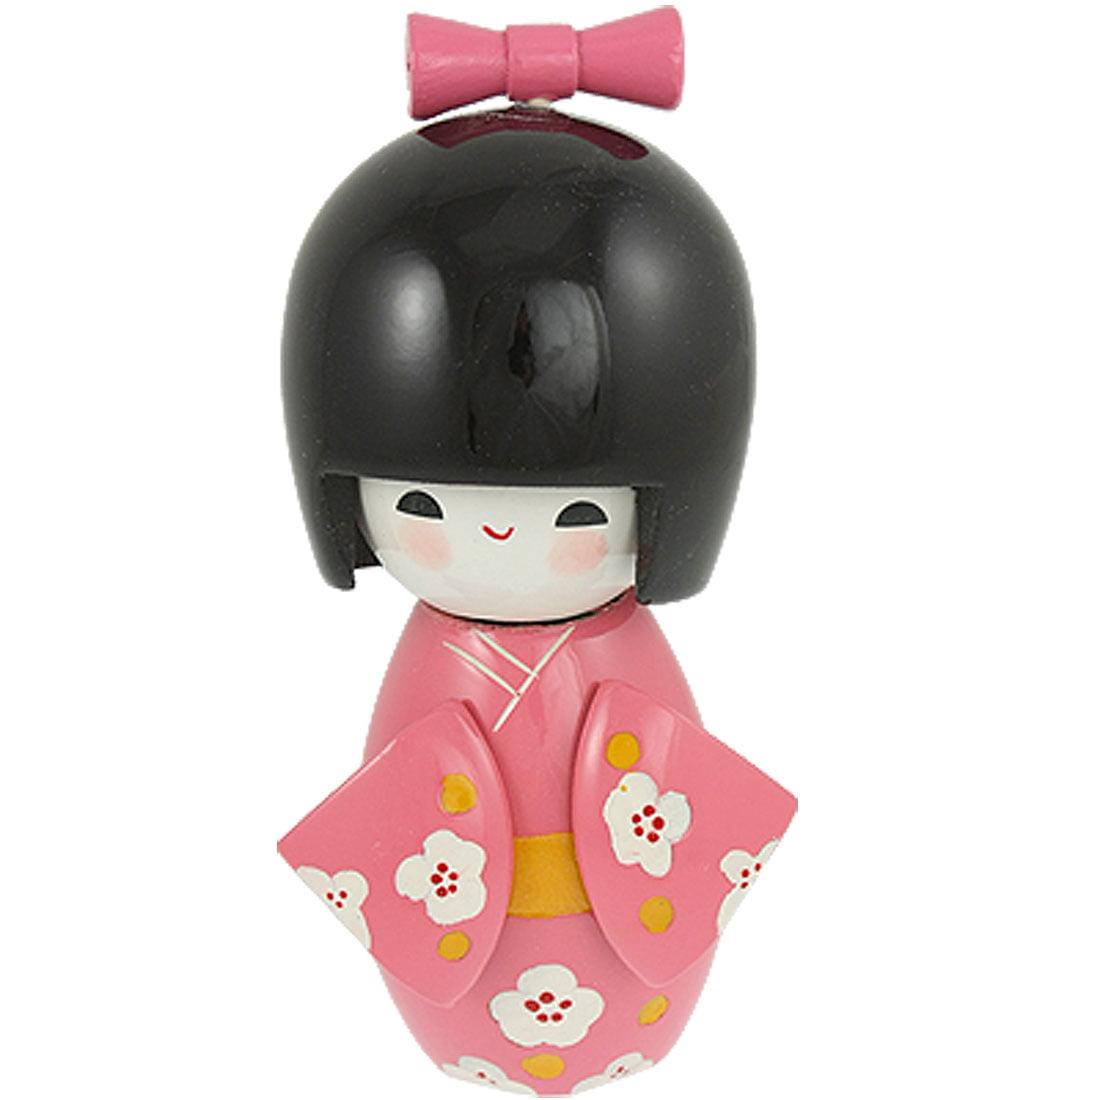 Bowtie Decor Smiling   Pink Kimono Japanese Kokeshi Doll Toy - image 1 of 1